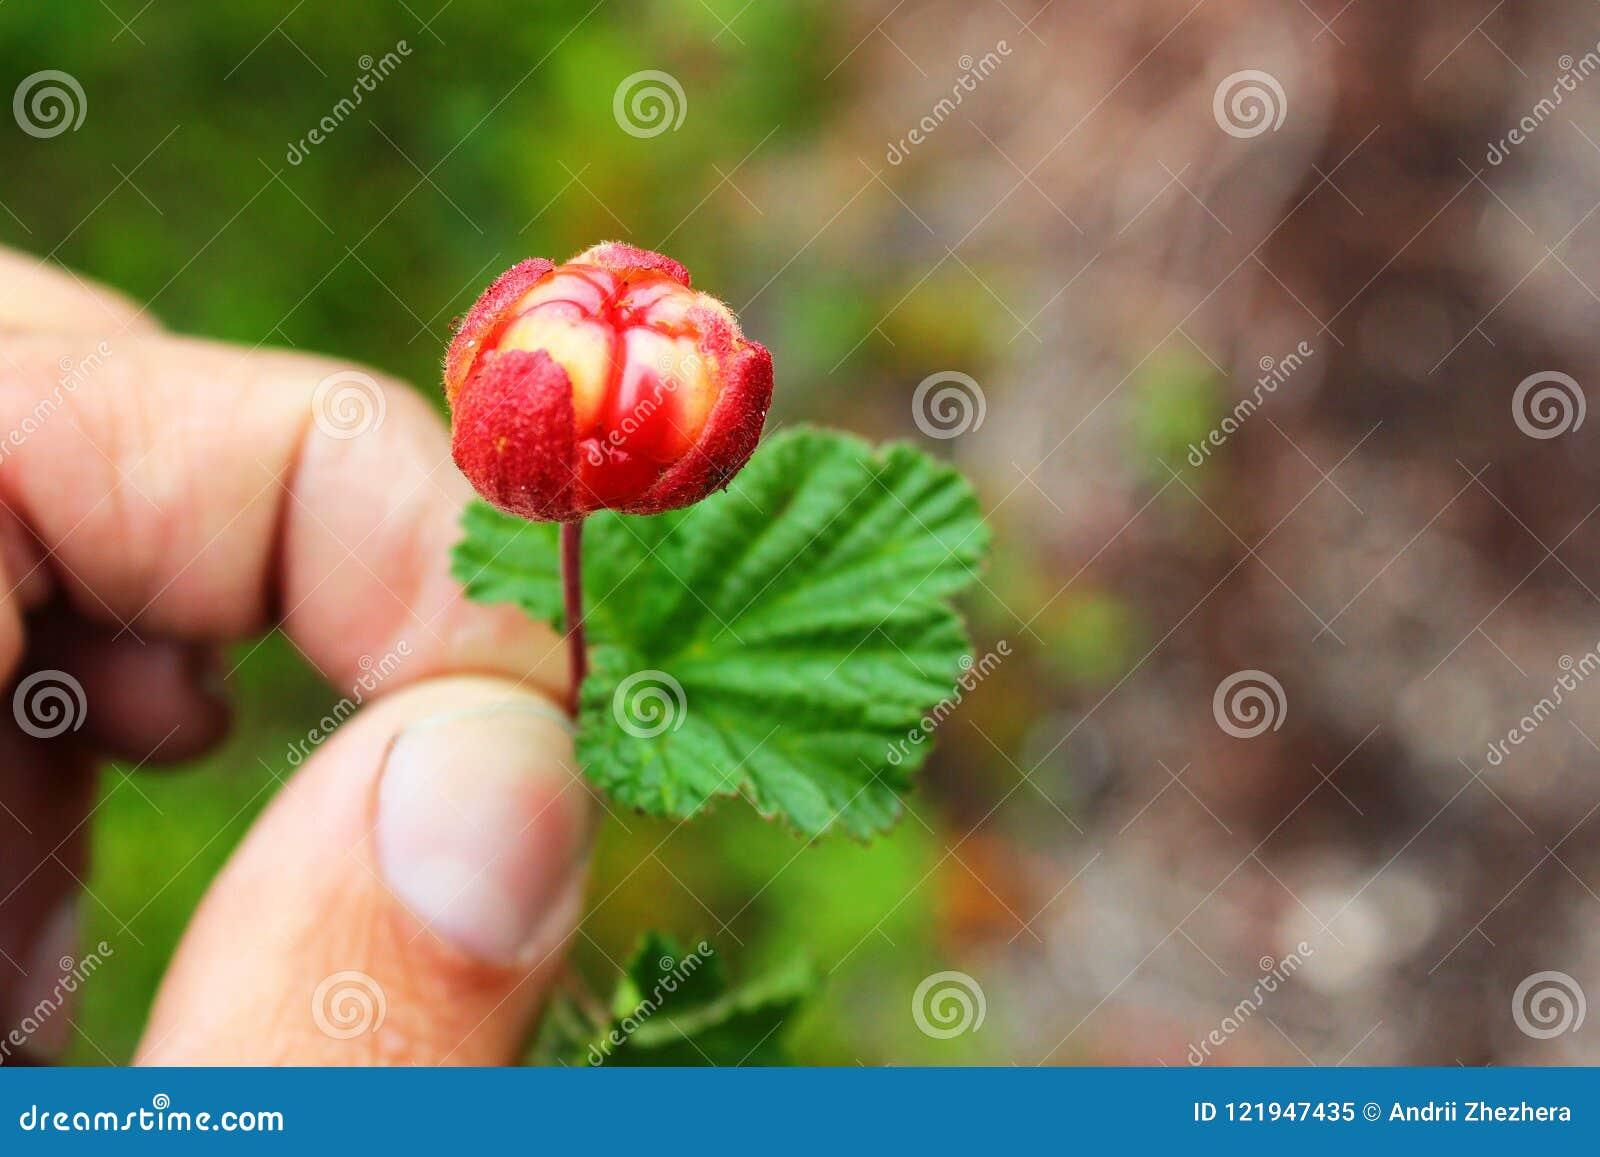 Hand holding a cloudberry Rubus chamaemorus